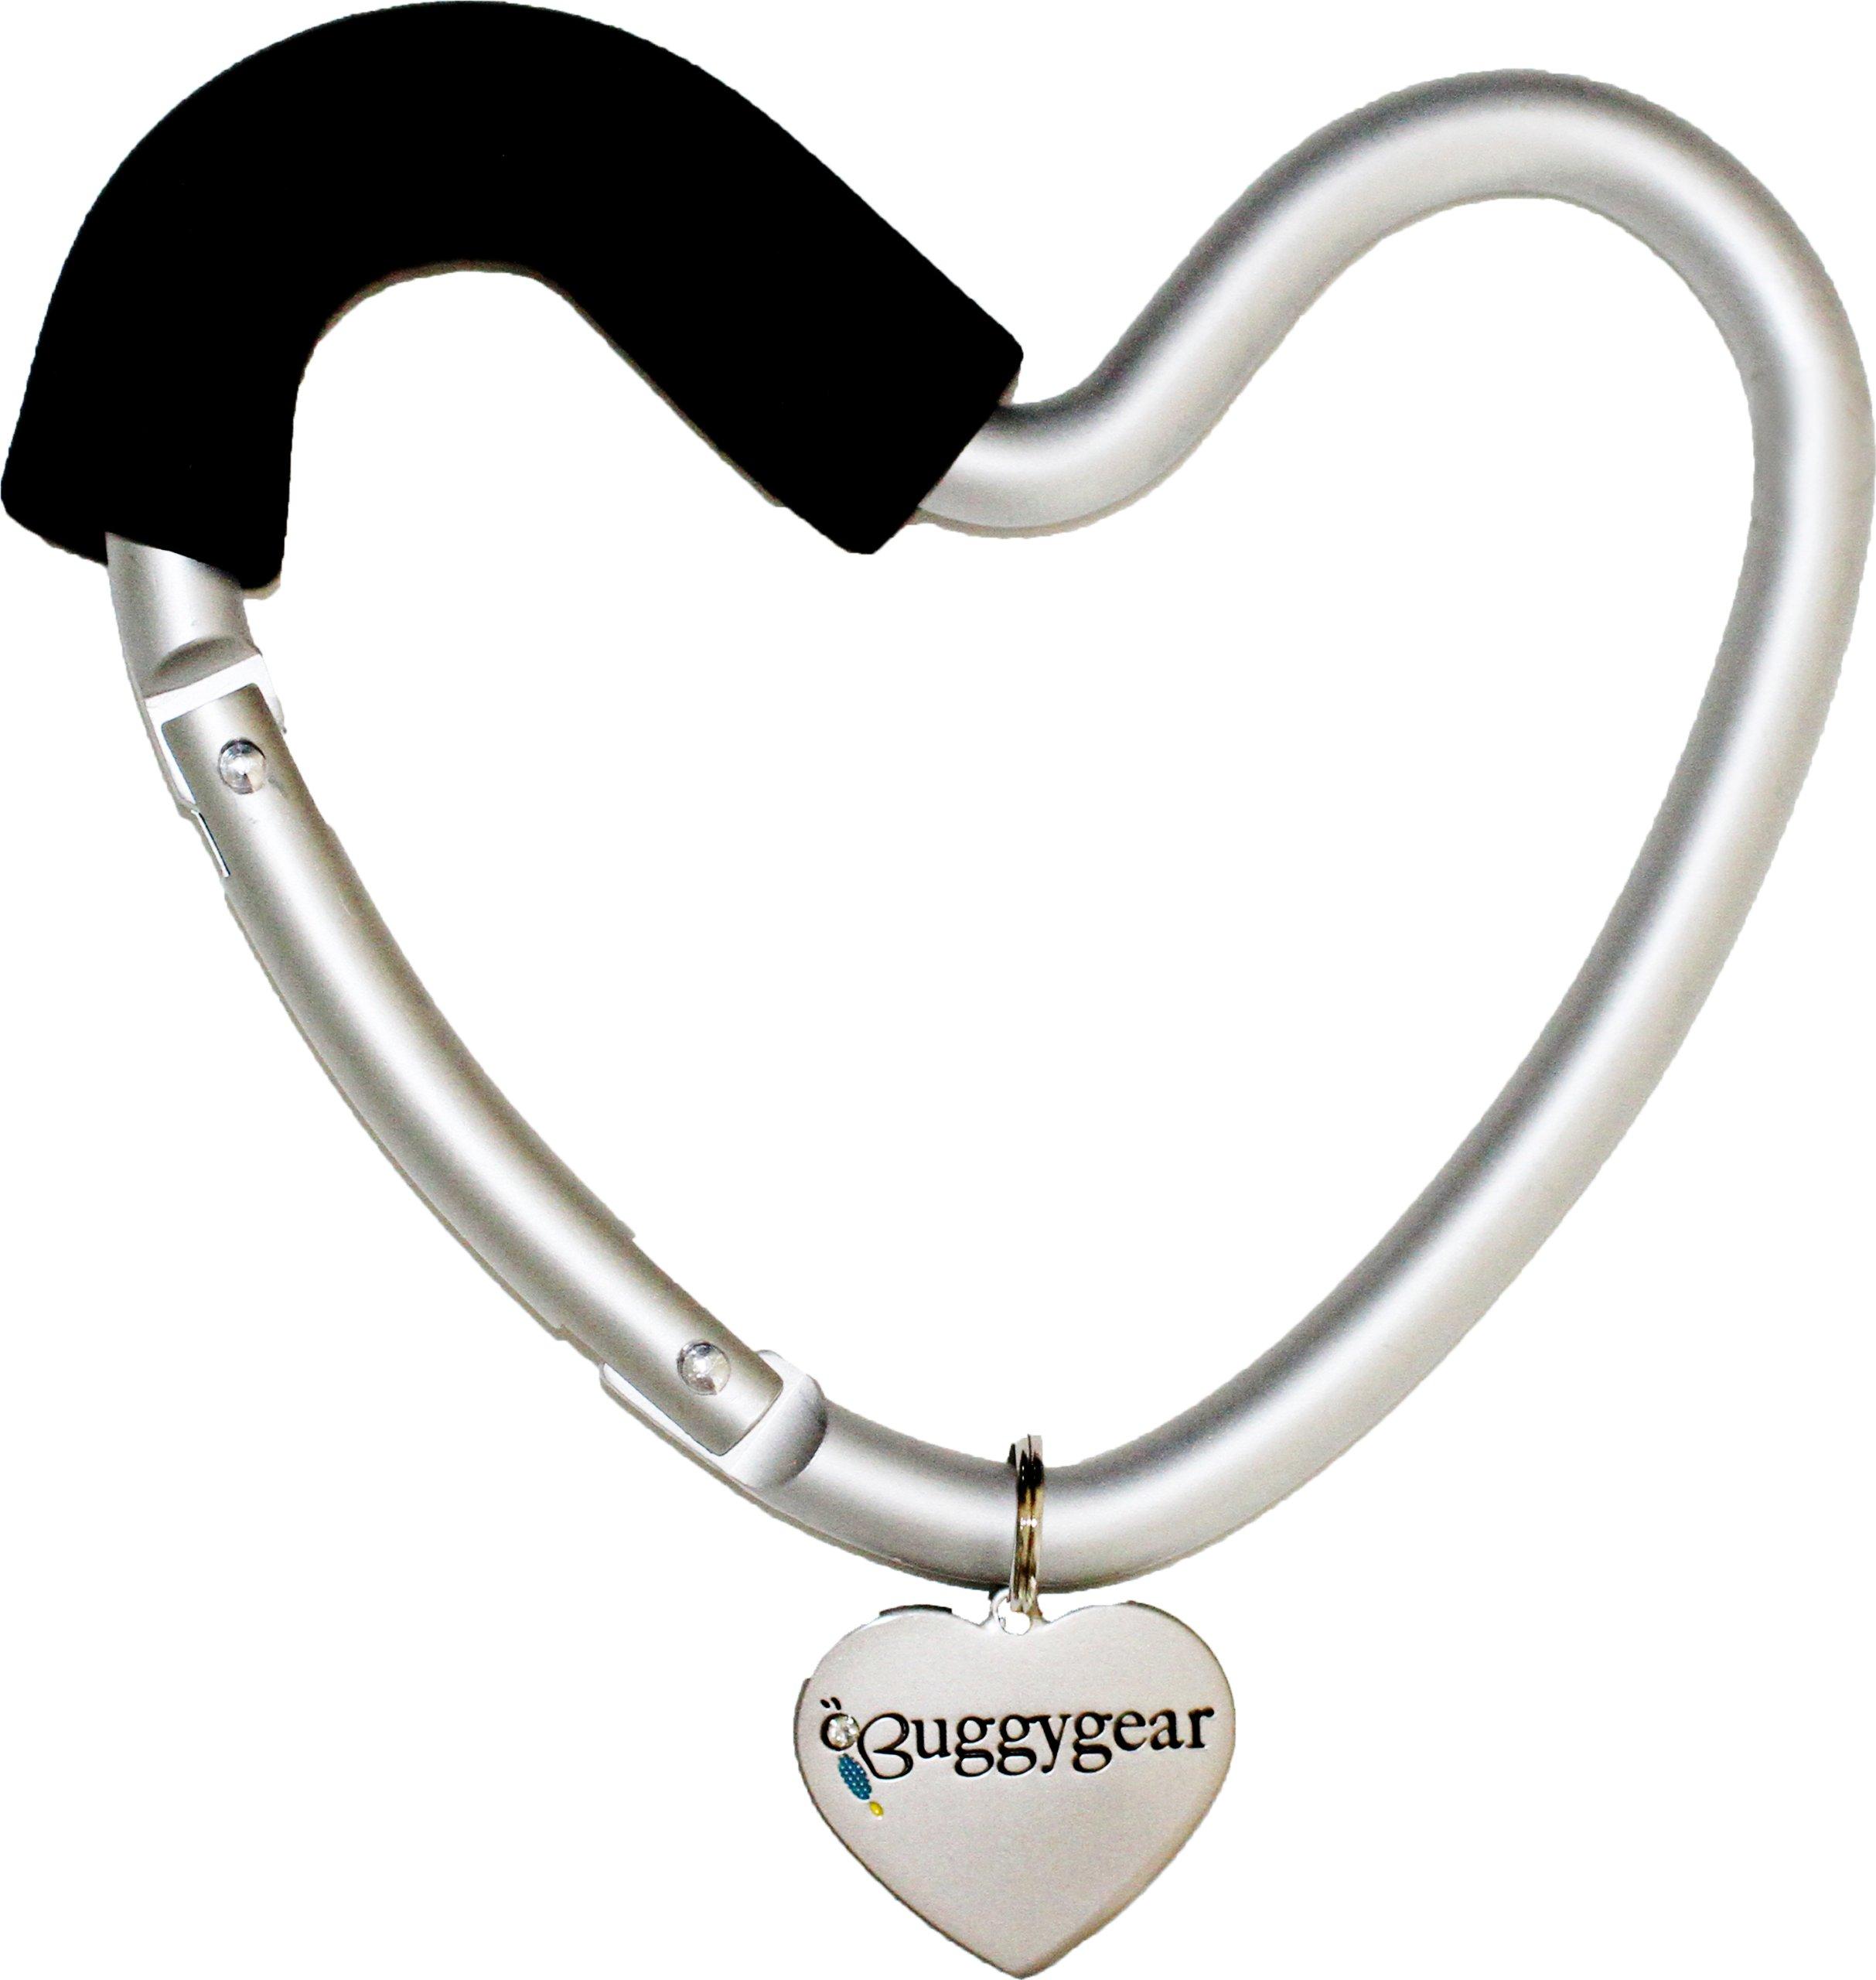 Baby Stroller Hook Heart -Diaper bag purse accessories hanger clip big carabiner, Black/Silver by Buggygear